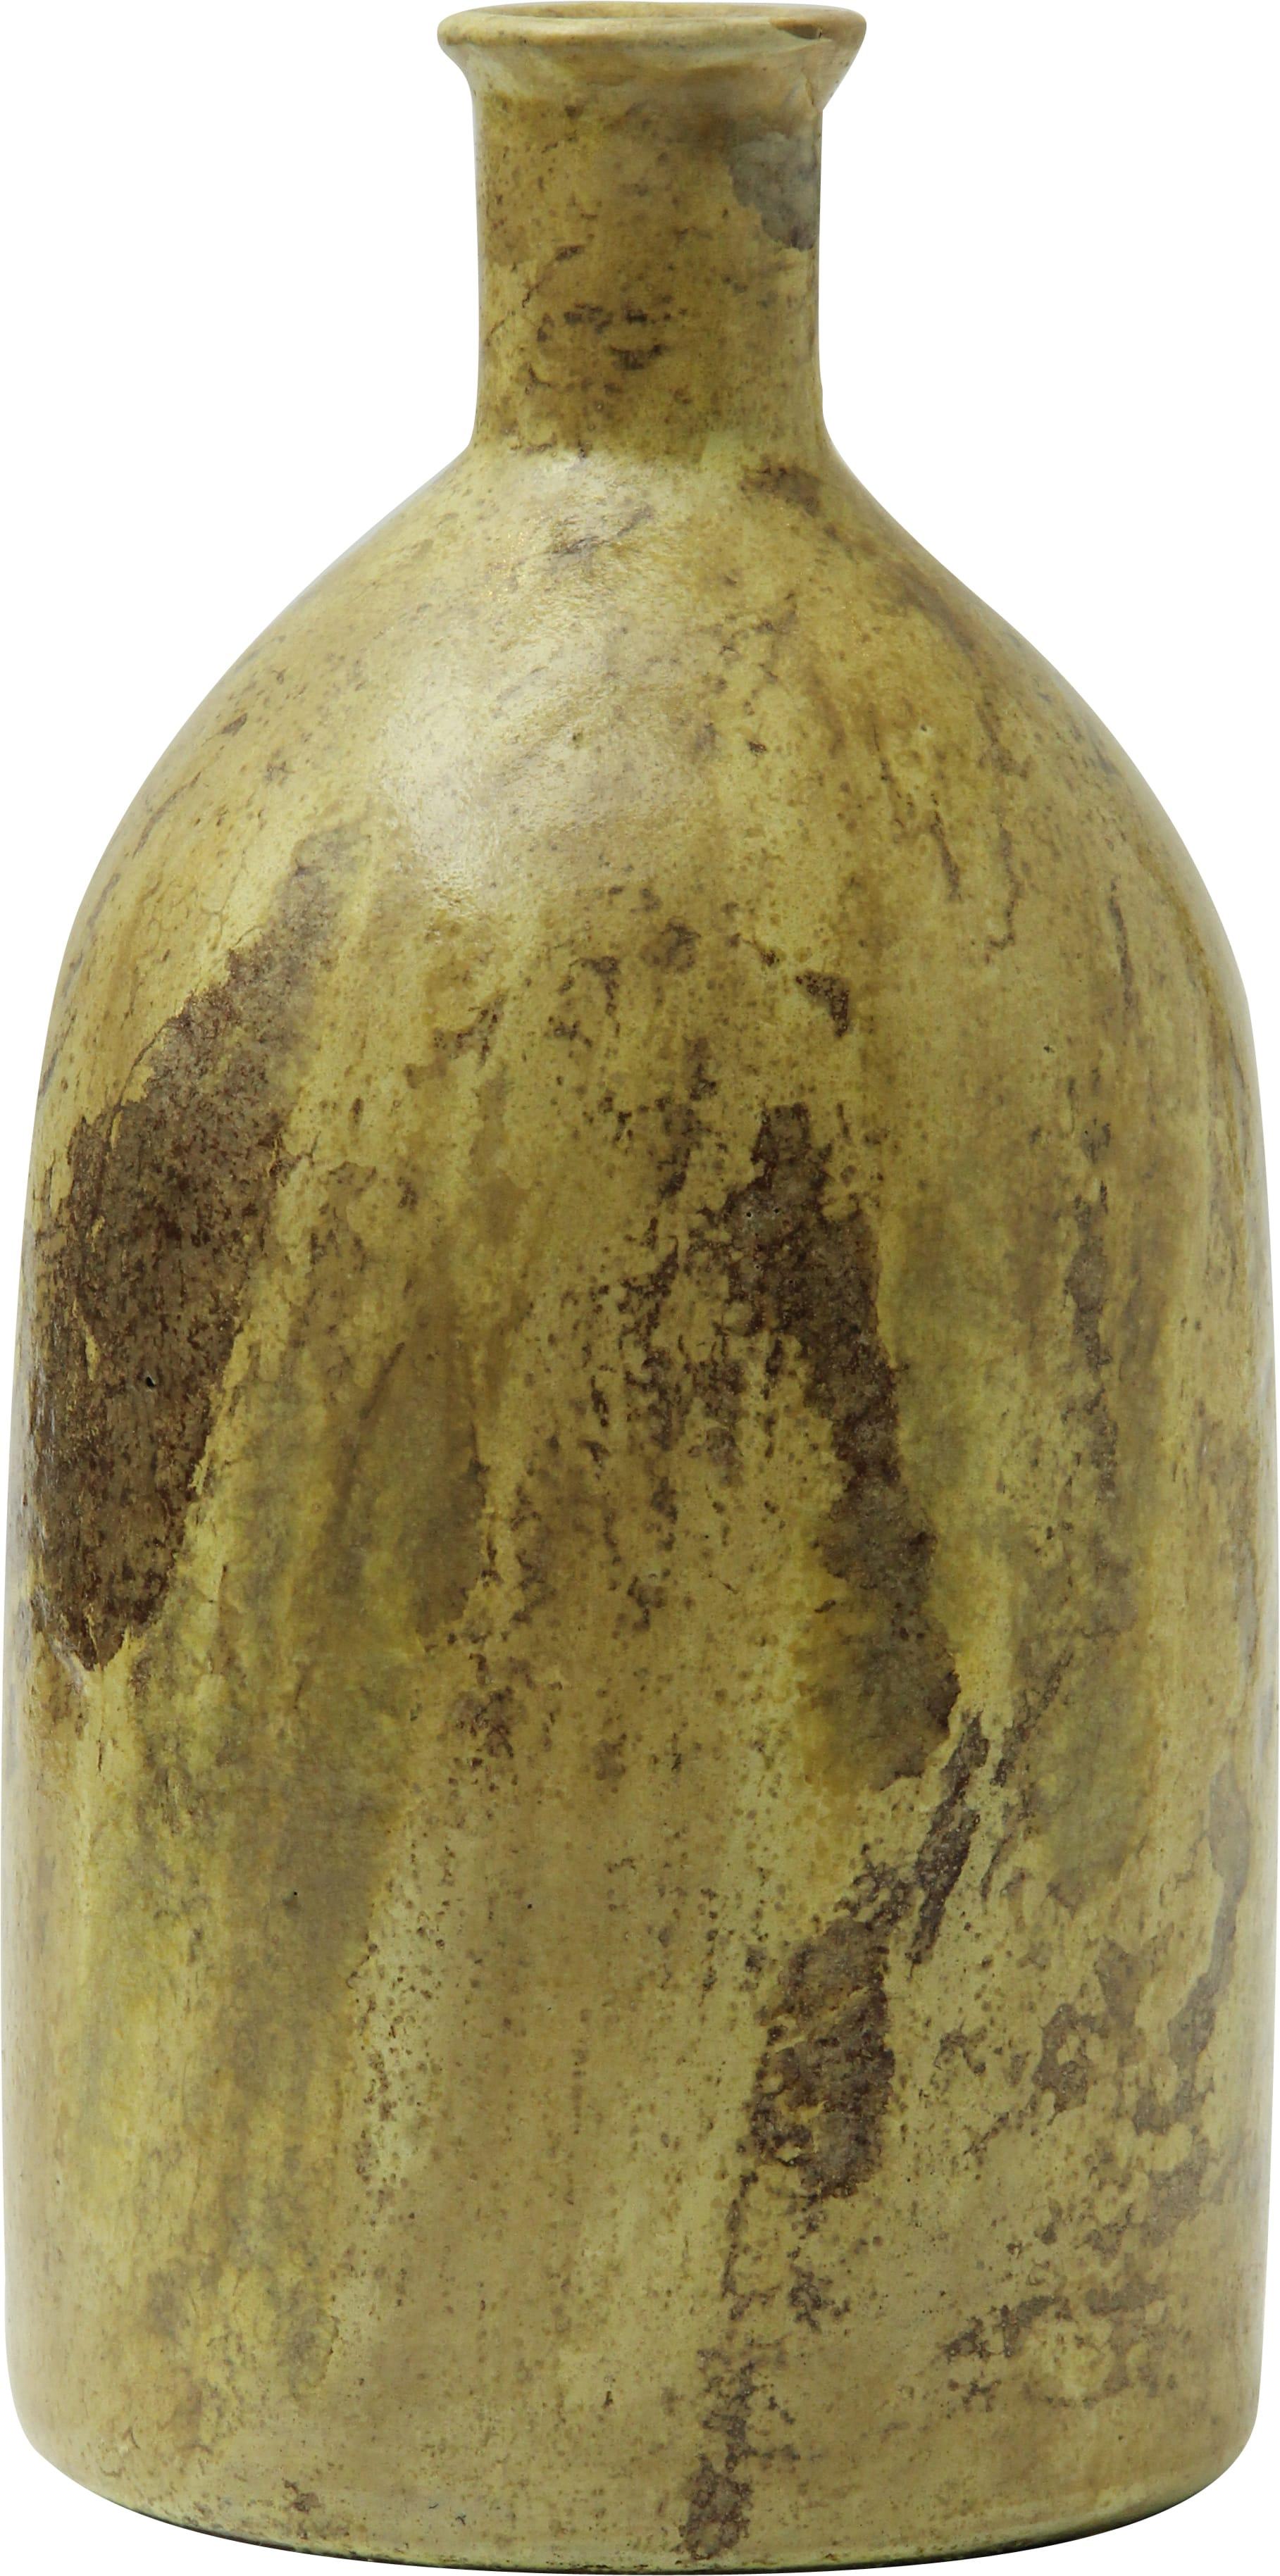 https://www.designidk.com/images/2288/tree-terracotta-bud-vase-in-mineral-yellow-395jpg